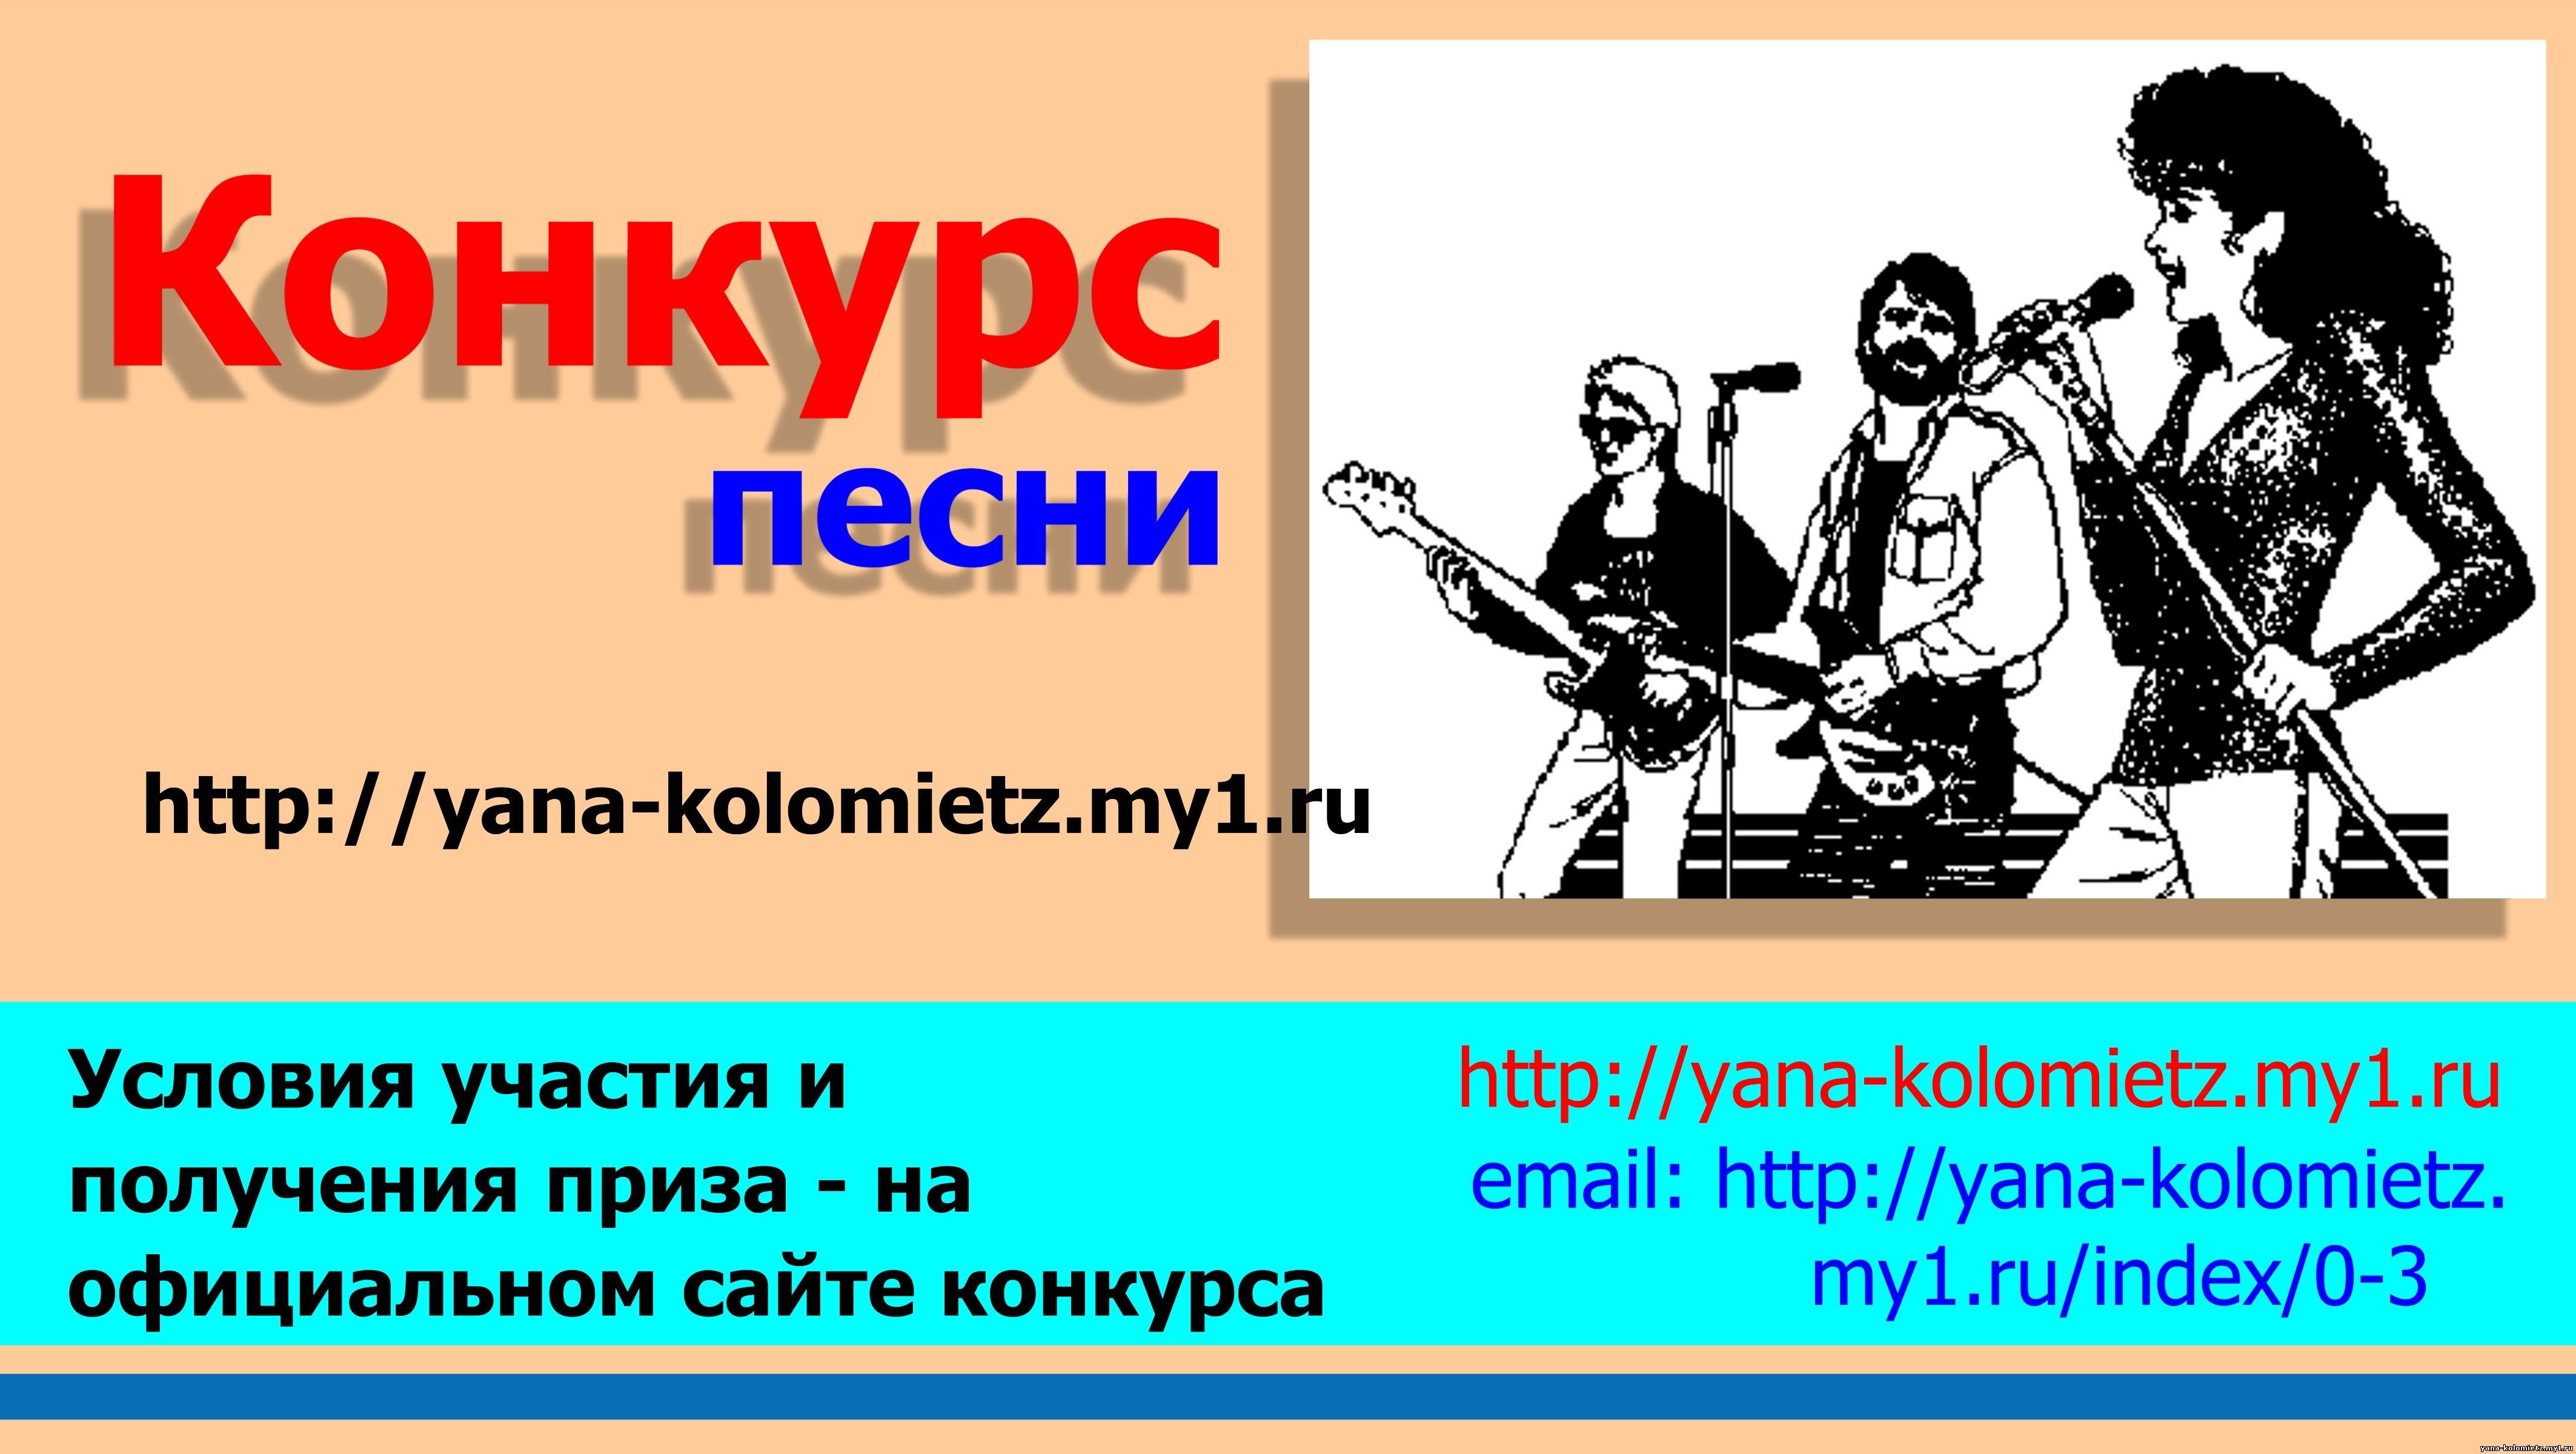 http://yana-kolomietz.my1.ru/foto/konkurs.jpg